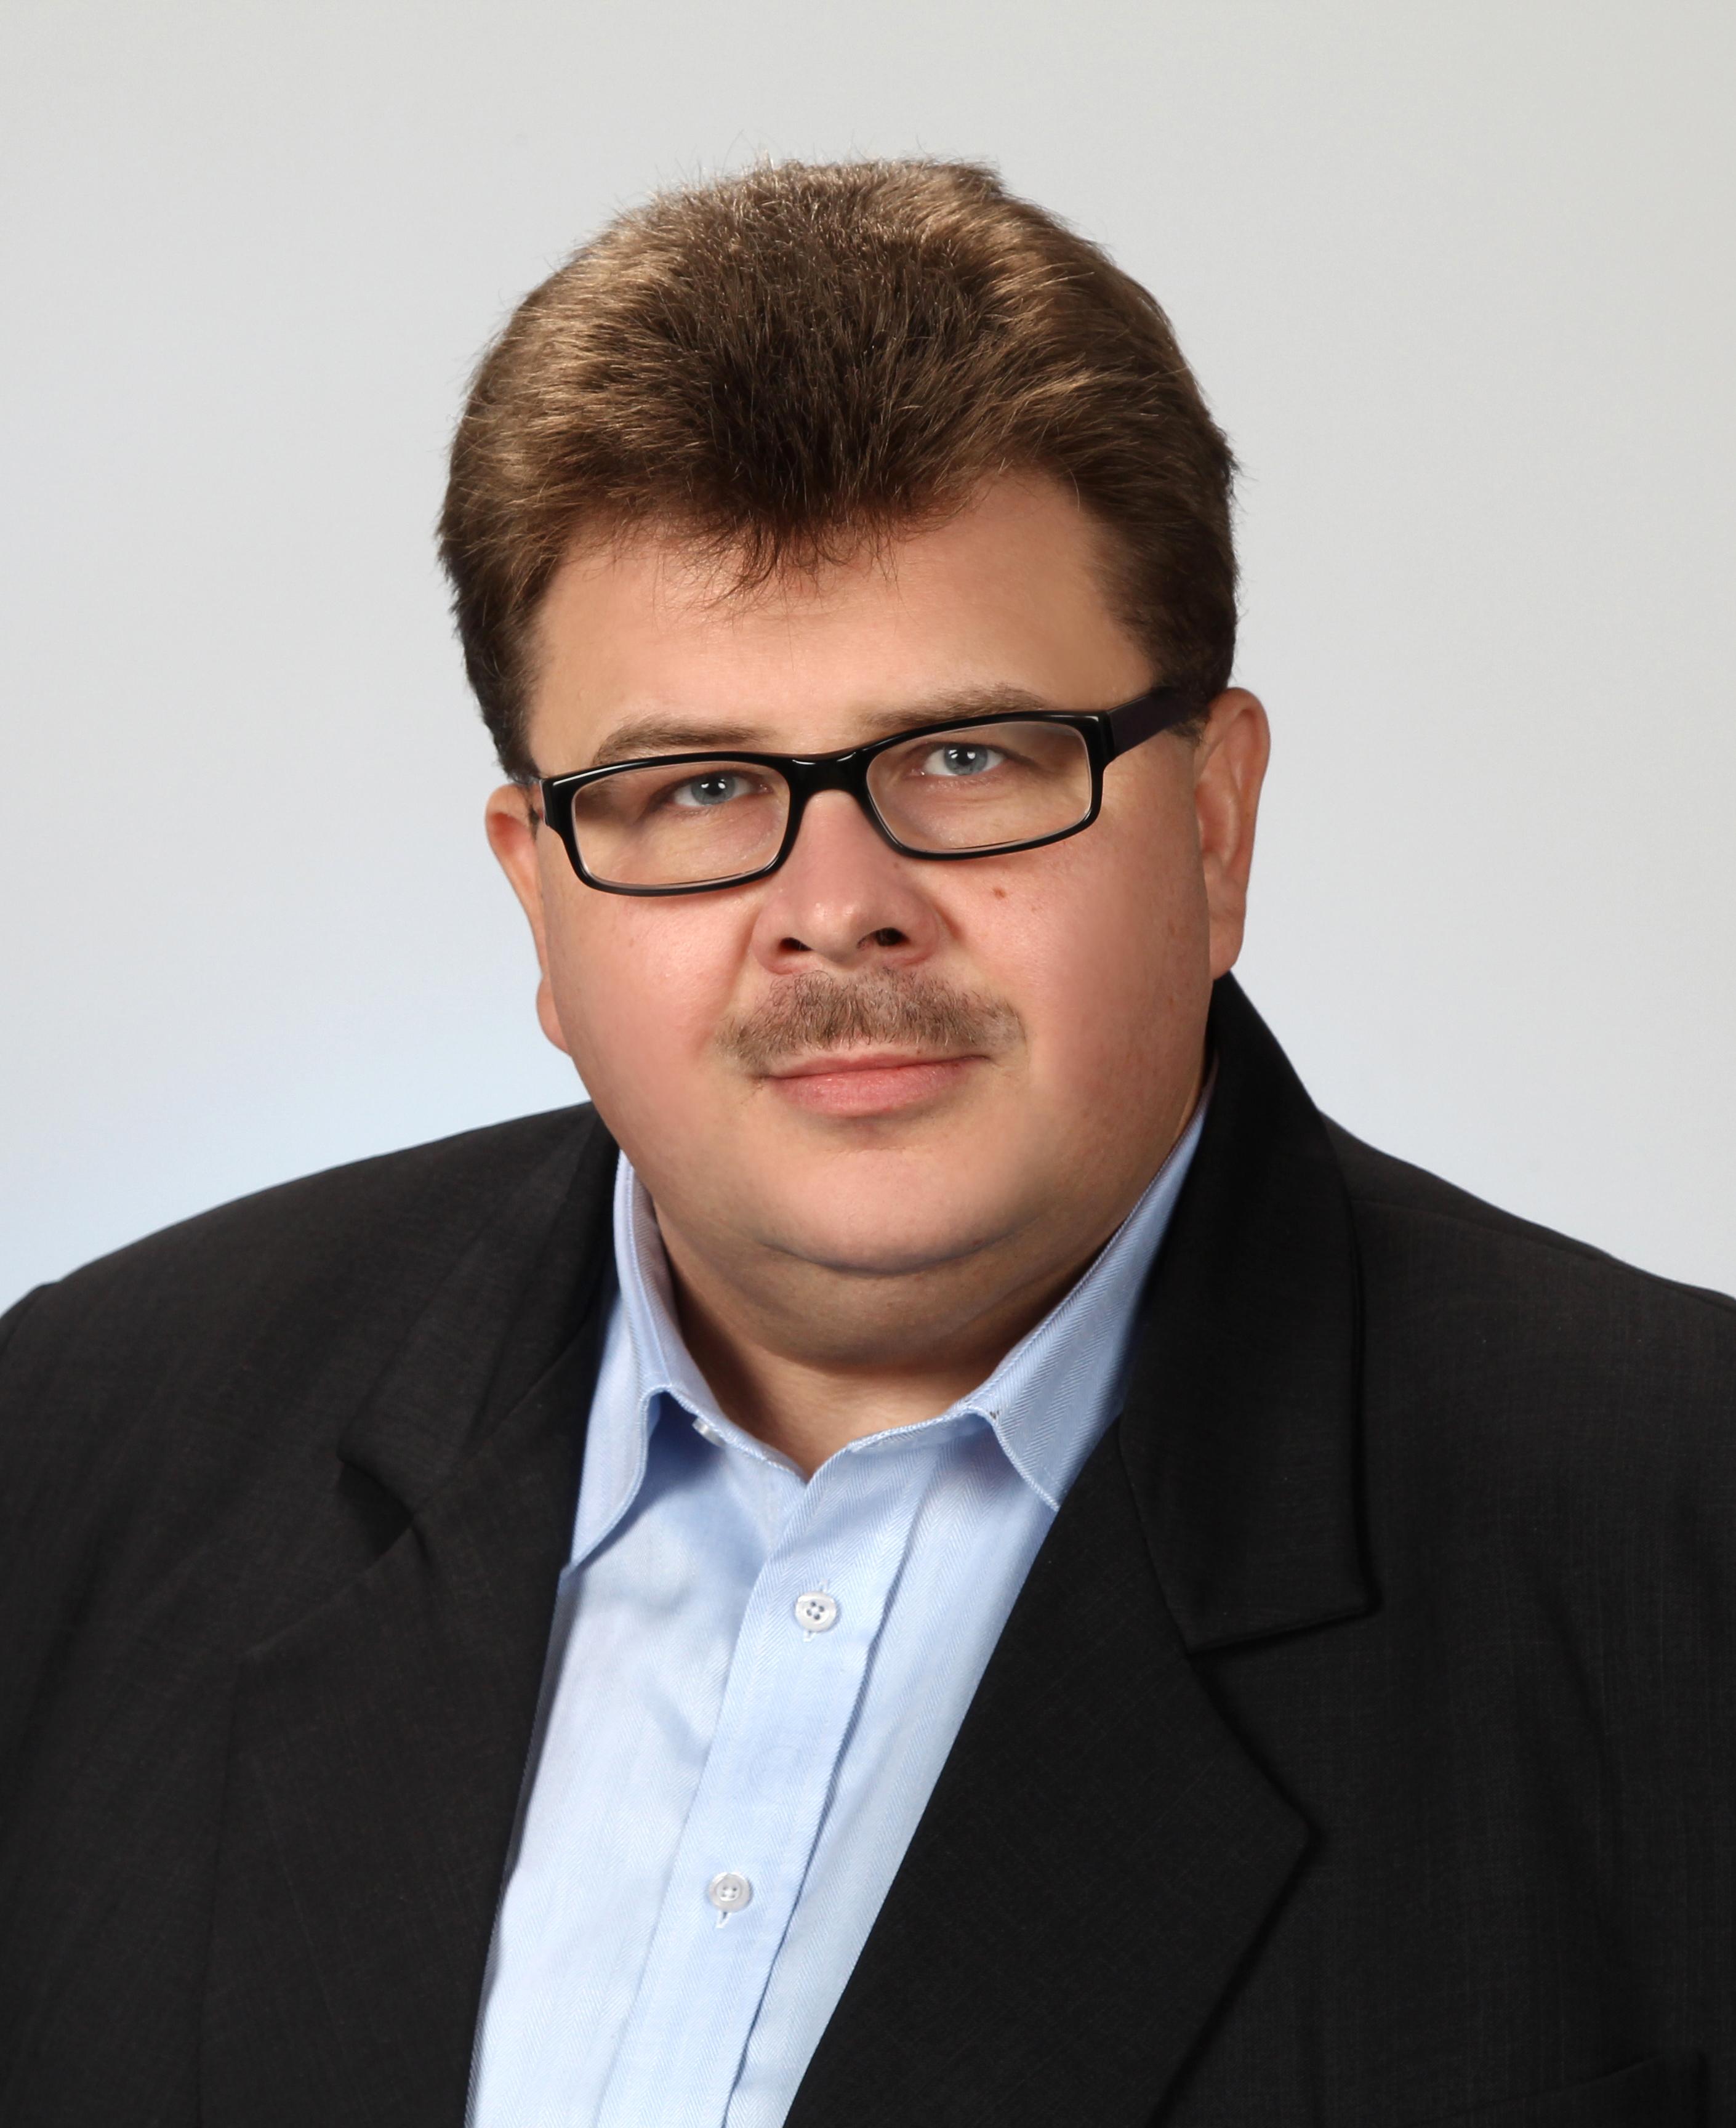 Robert Obaz